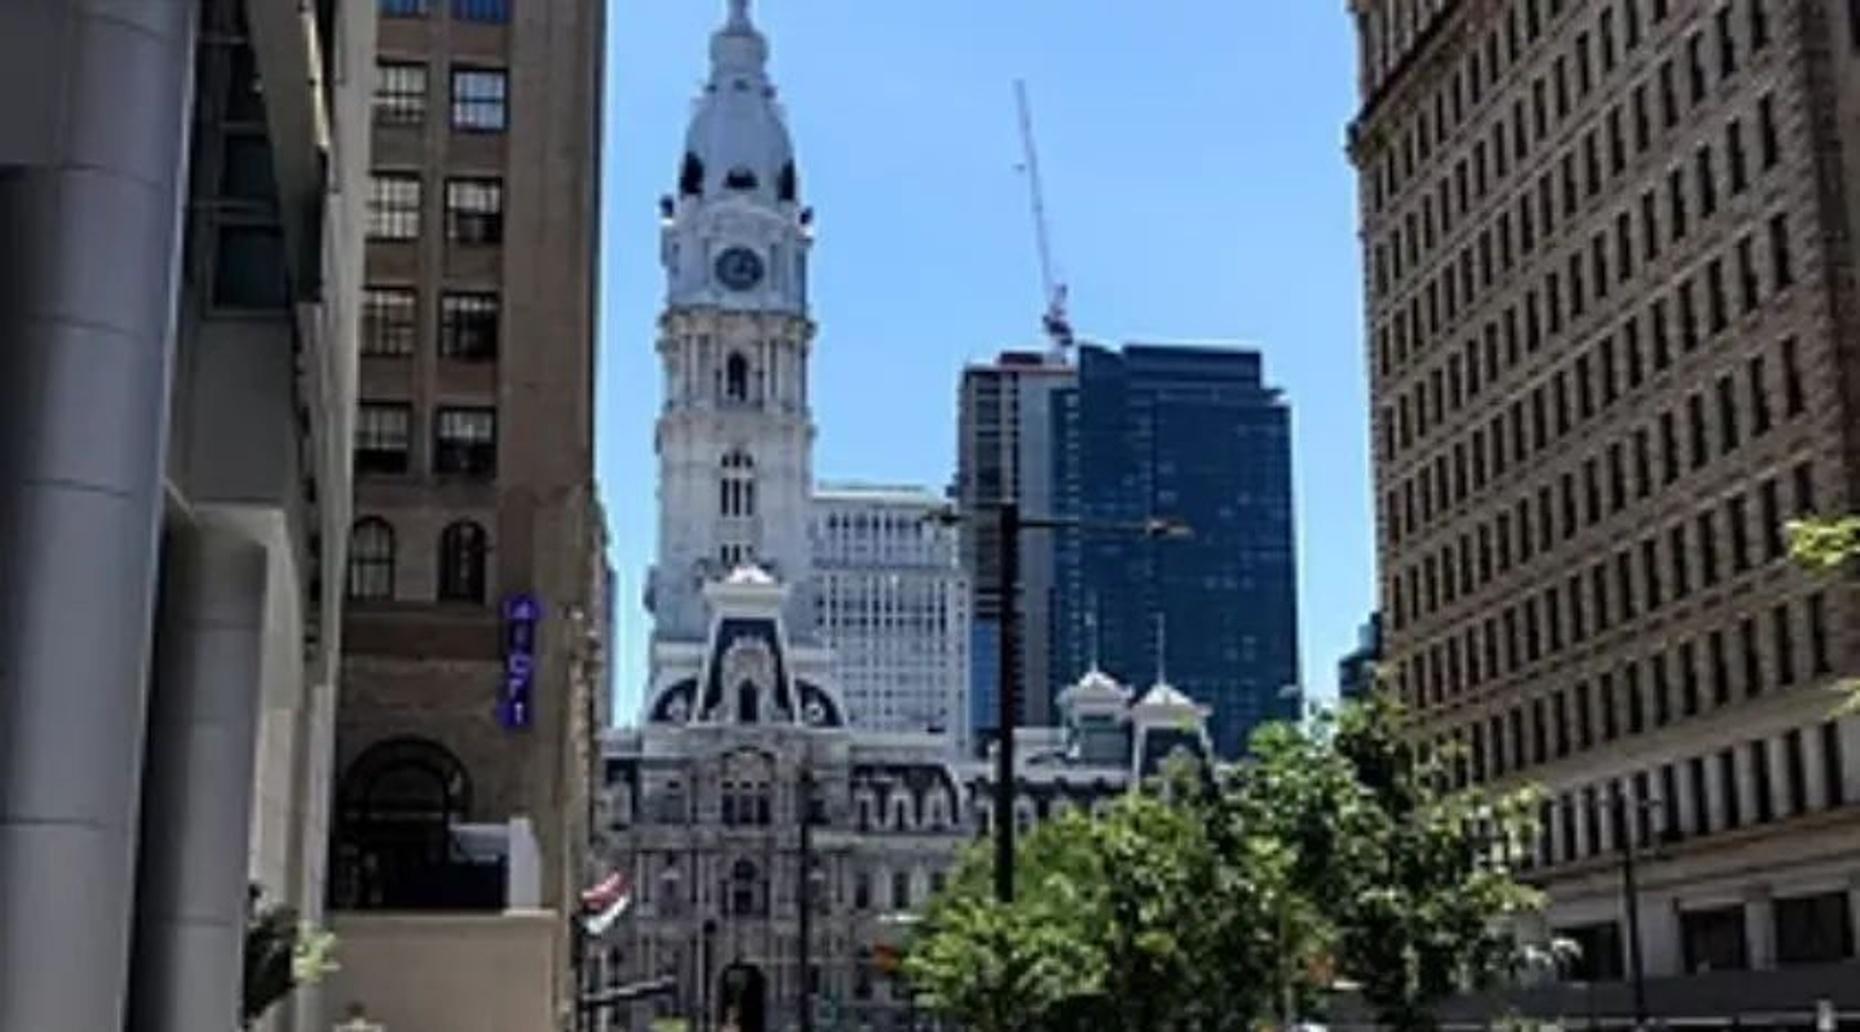 The Philly Classic Tour of Philadelphia